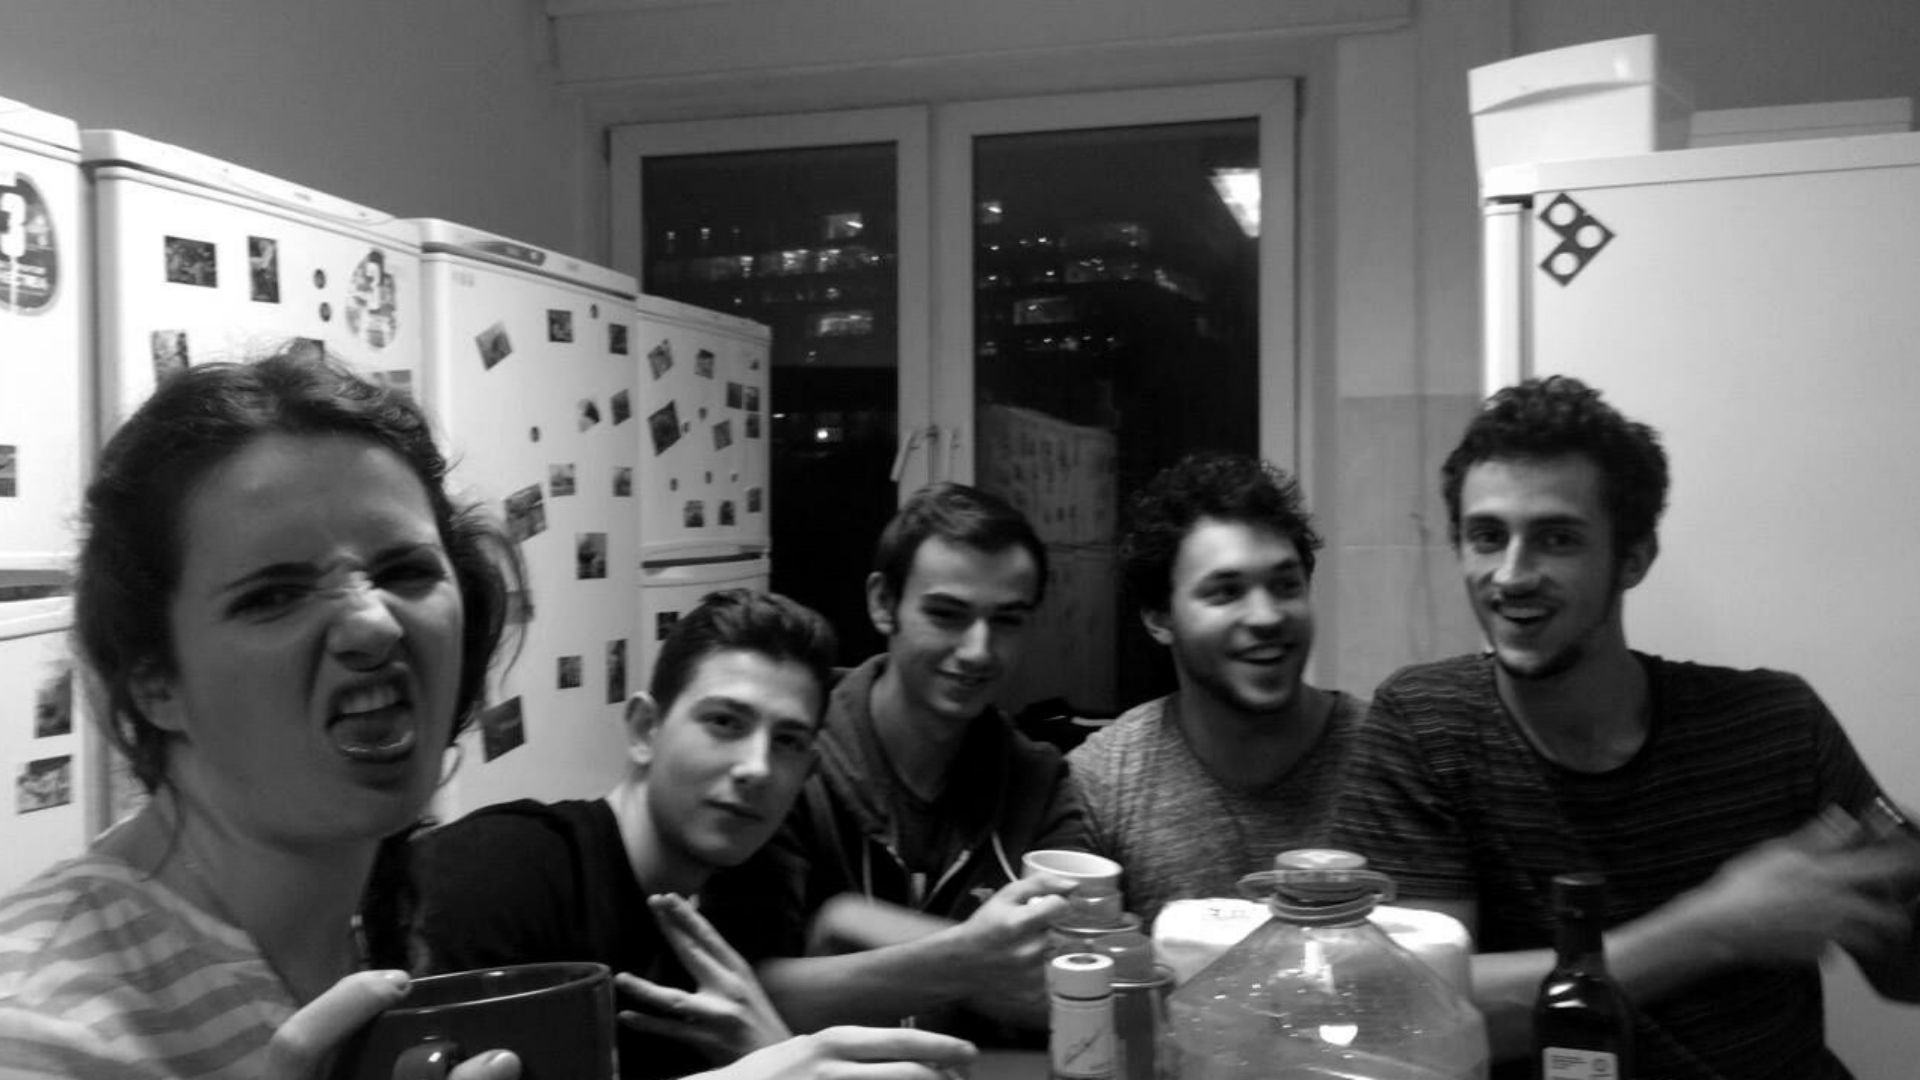 Agathe, Tanguy, Edgar, Victor, Yanis